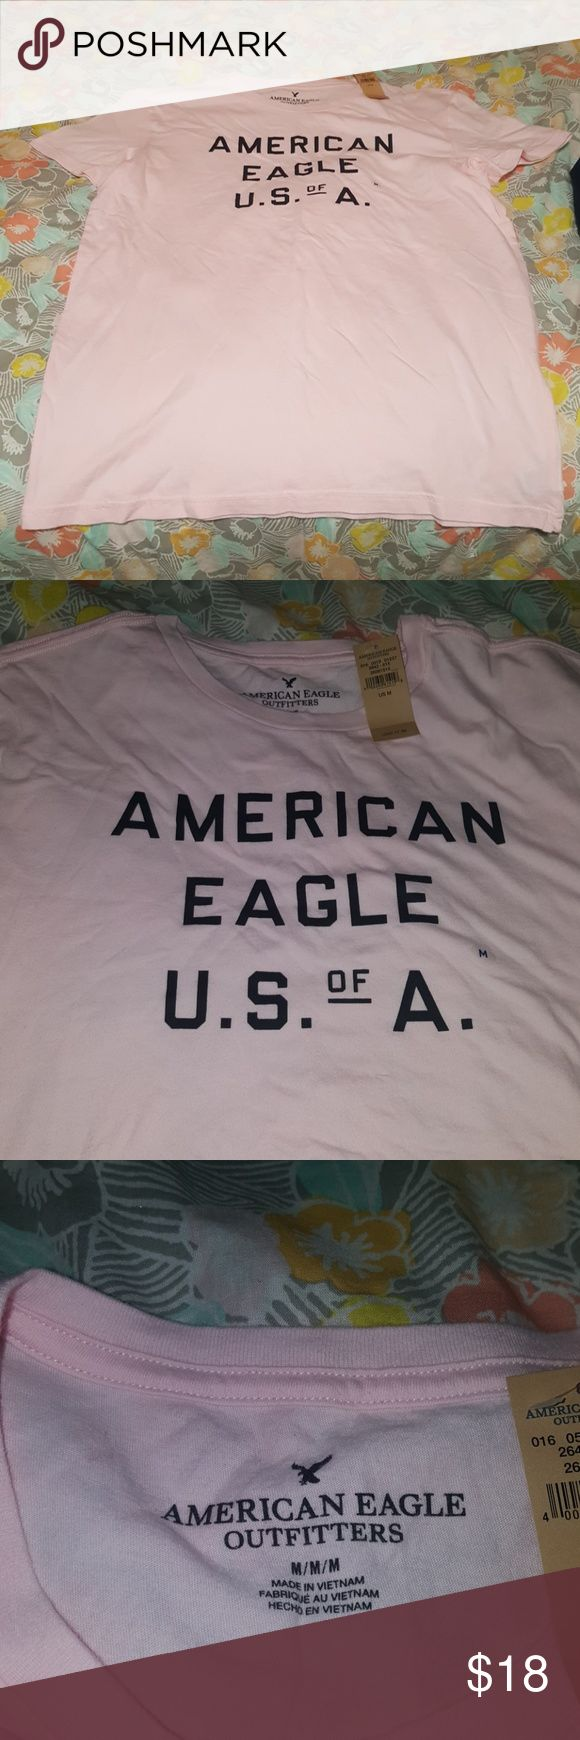 American Eagle shirt New American Eagle Shirts